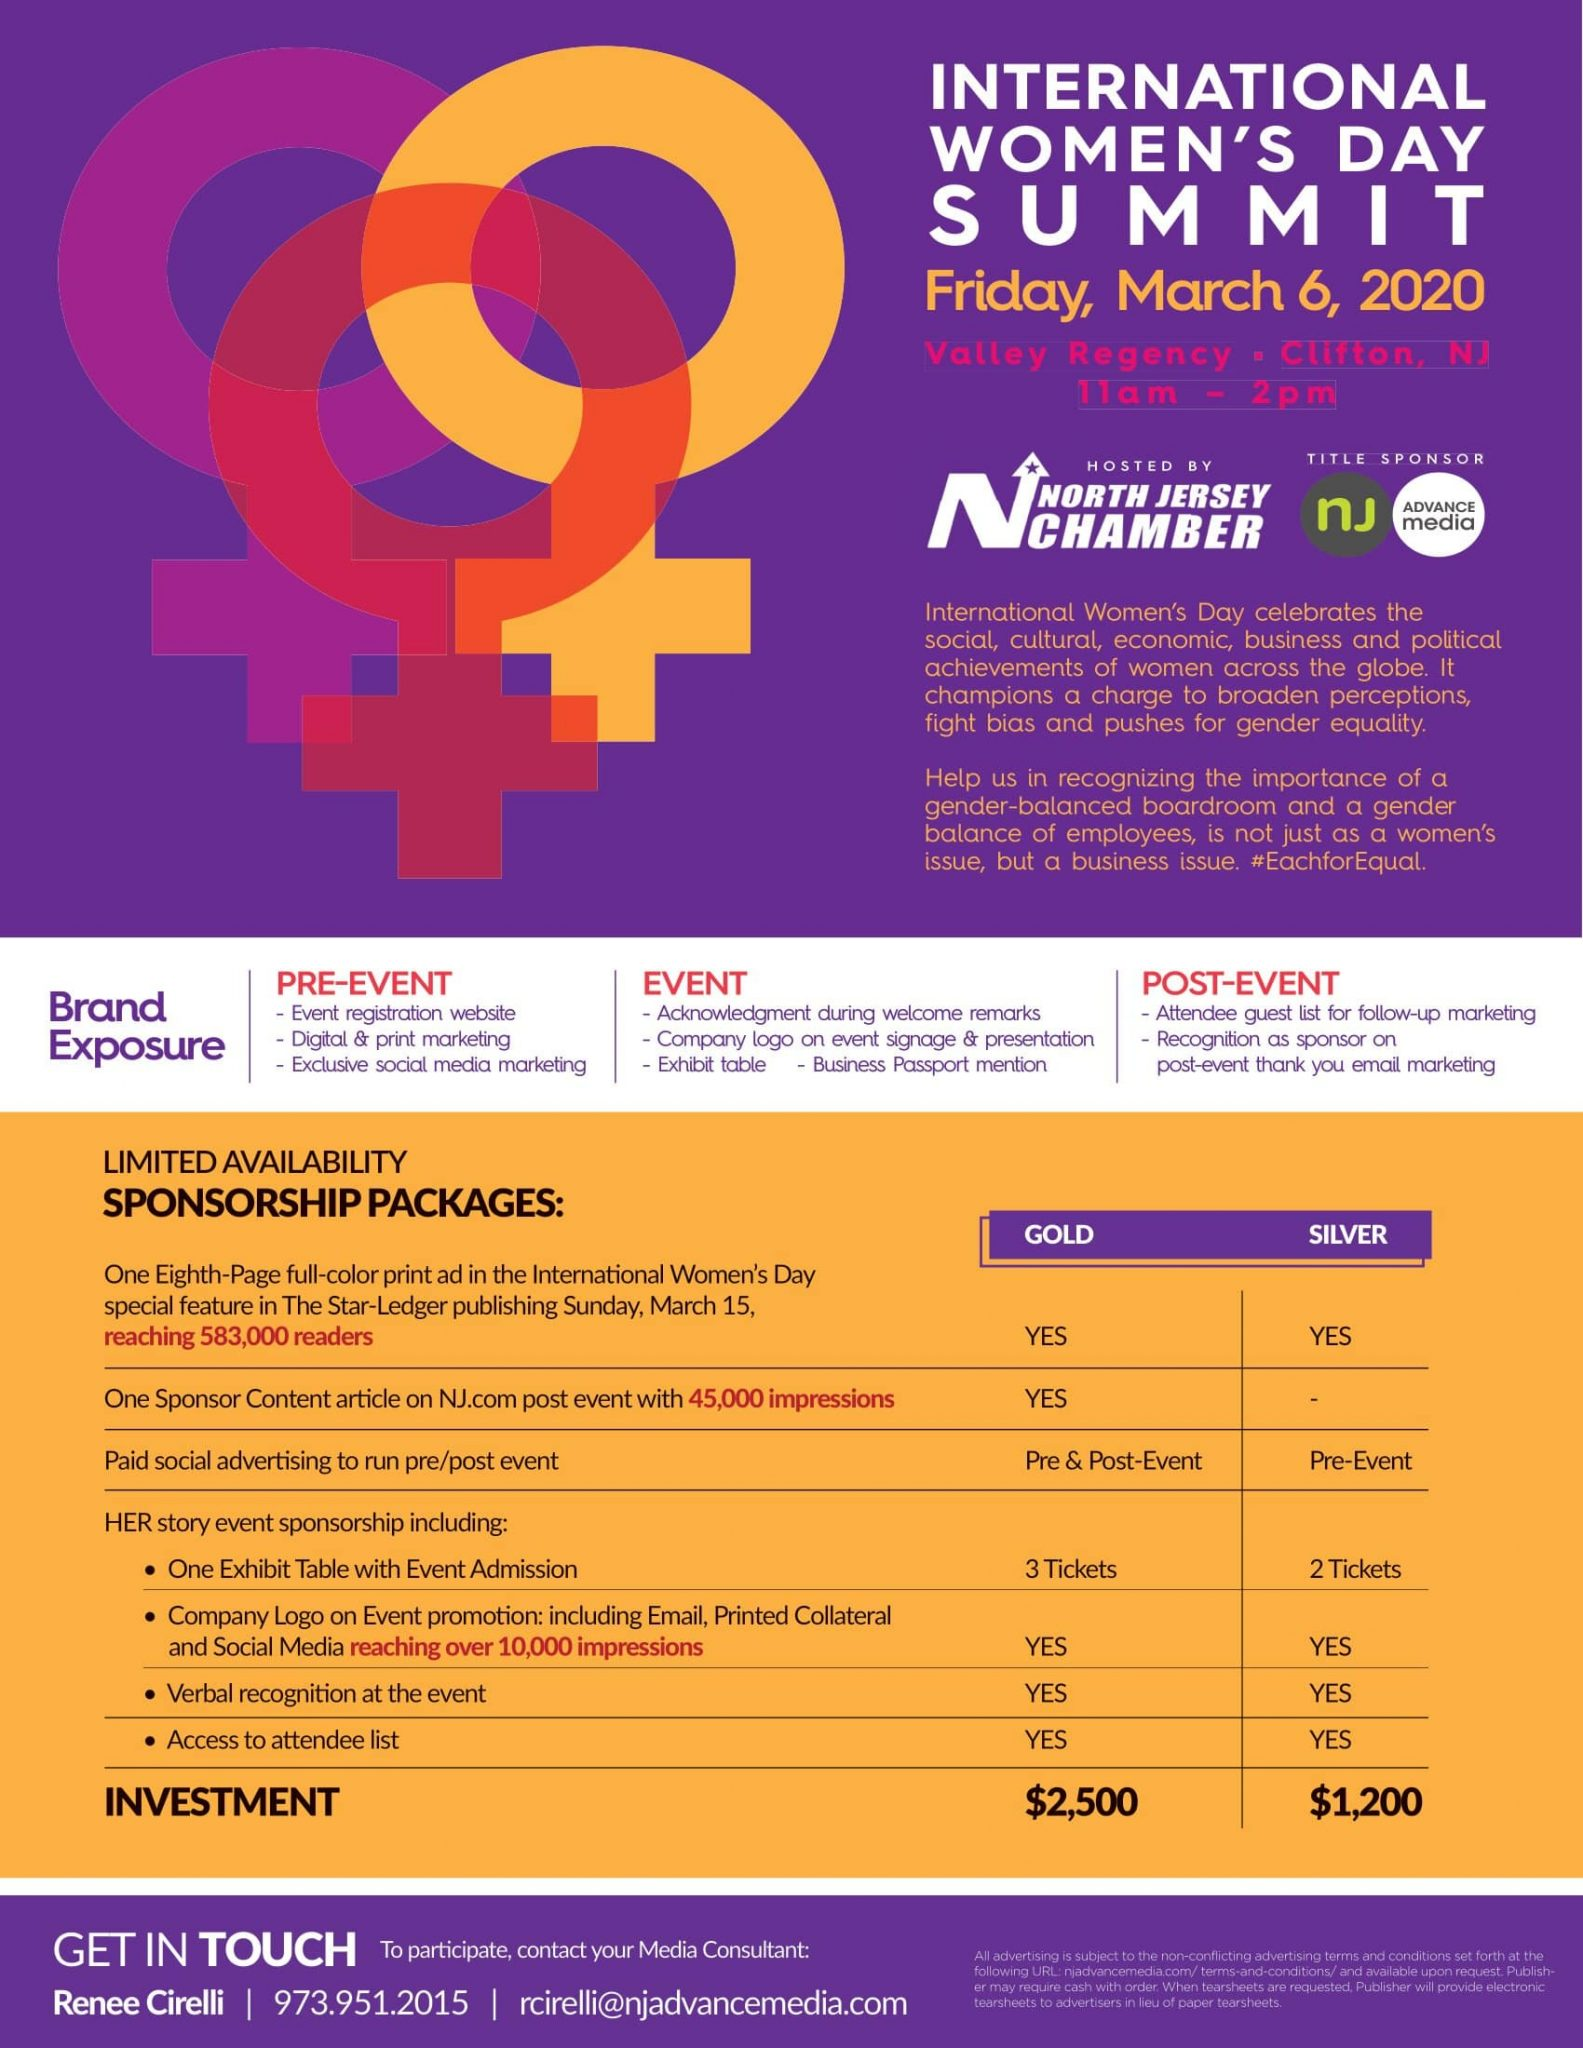 International Women's Day Summit, North Jersey Chamber of Commerce